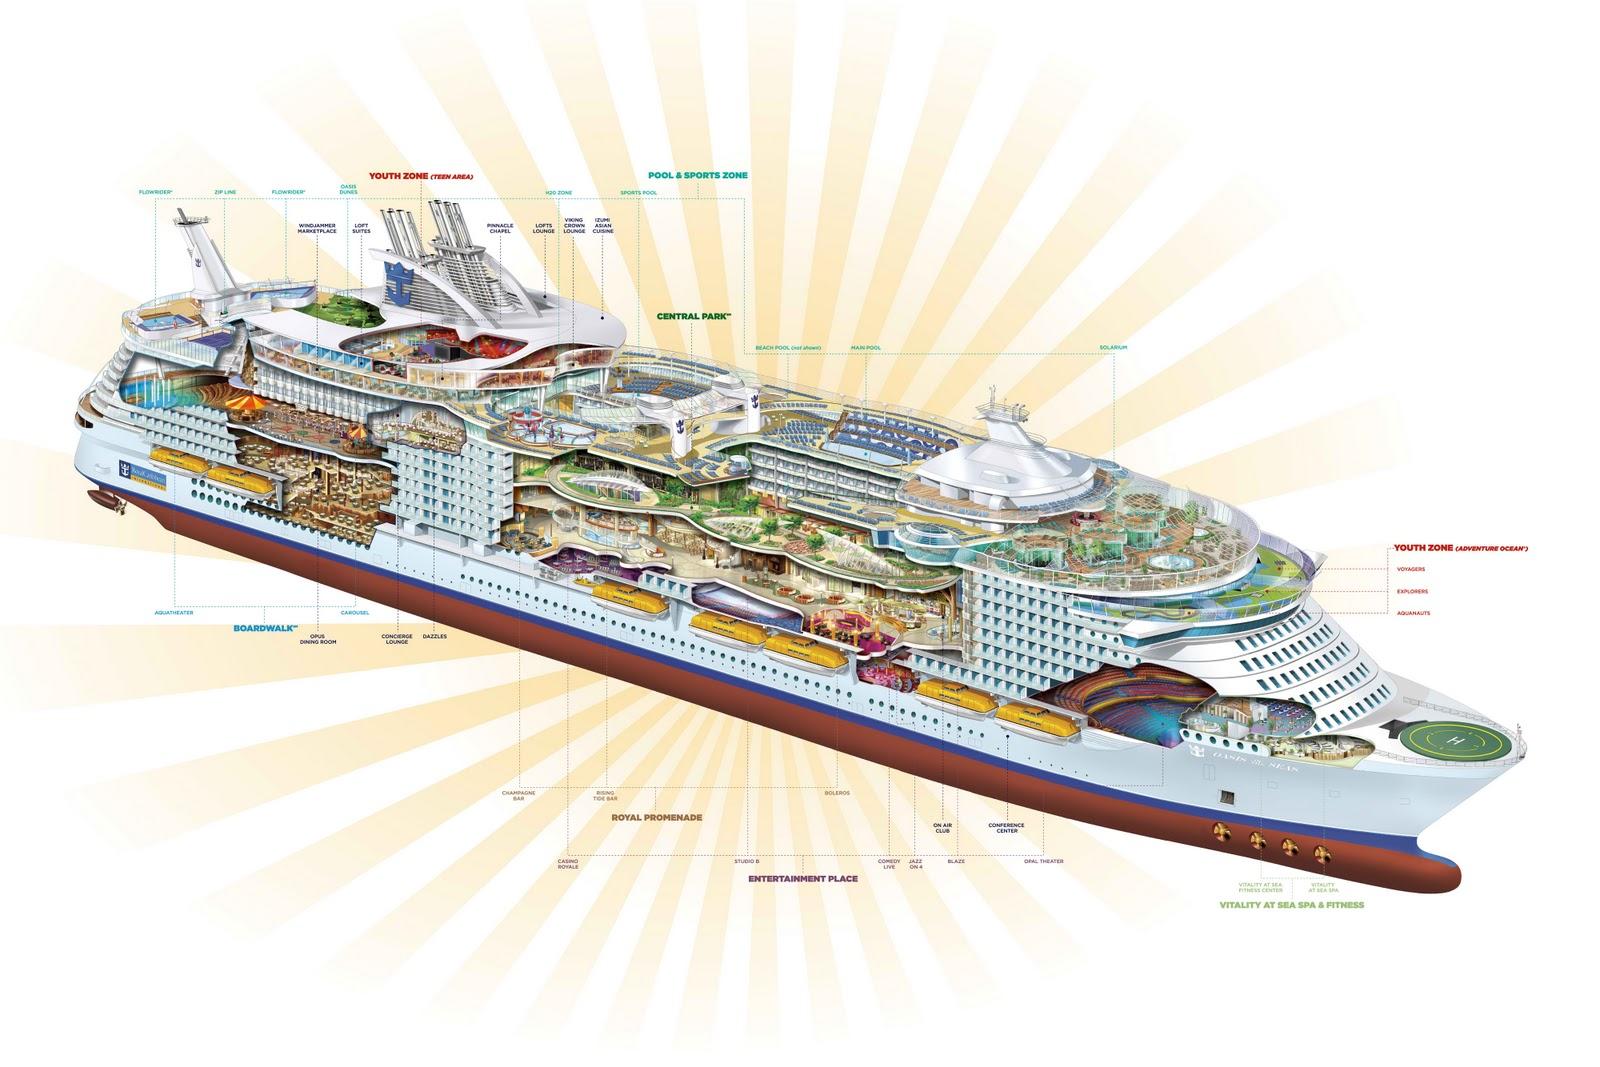 Simonas Fleet Ship Profiles 5 Allure Of The Seas